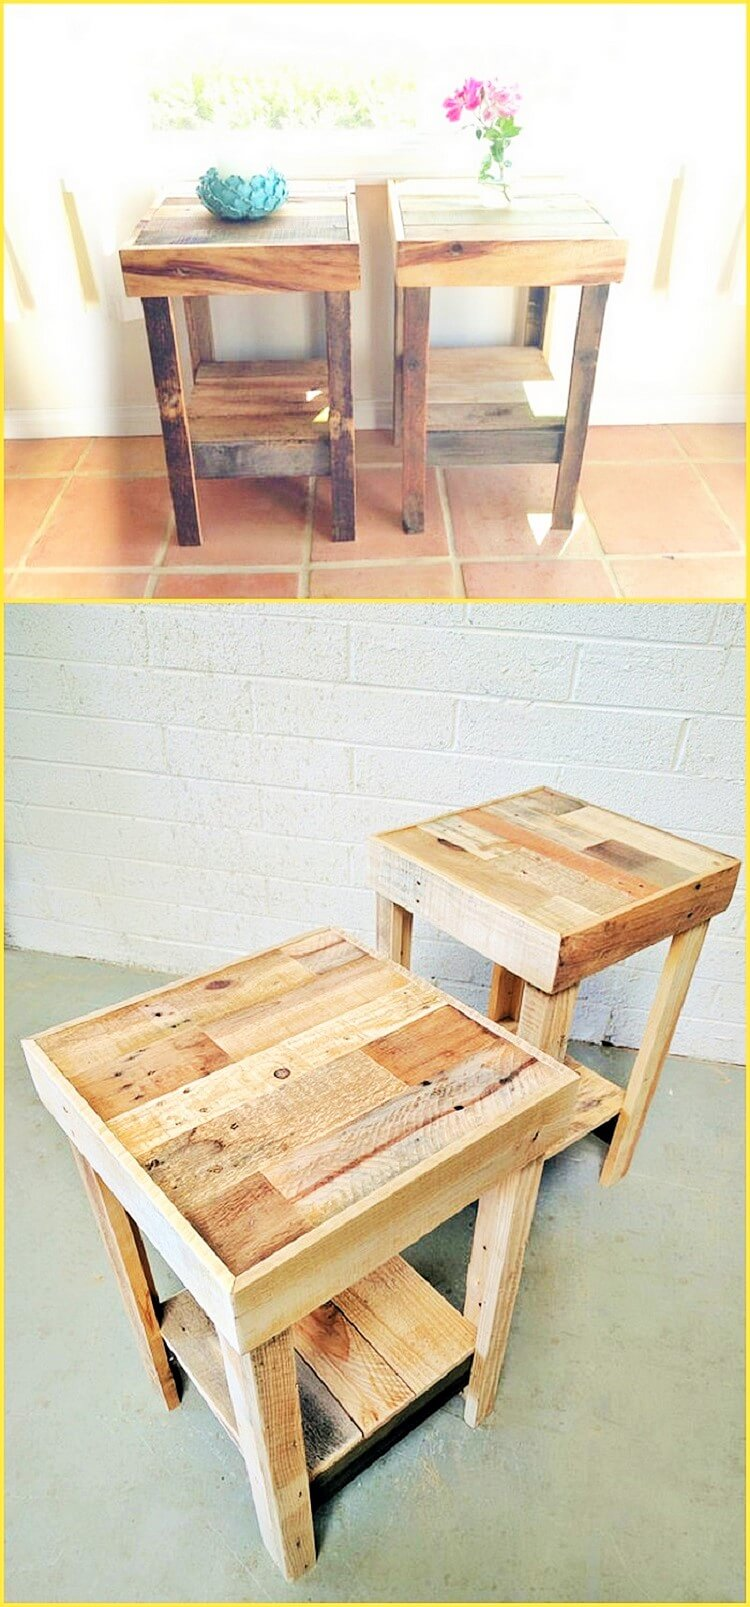 Wooden Pallets Ideas-4 (2)